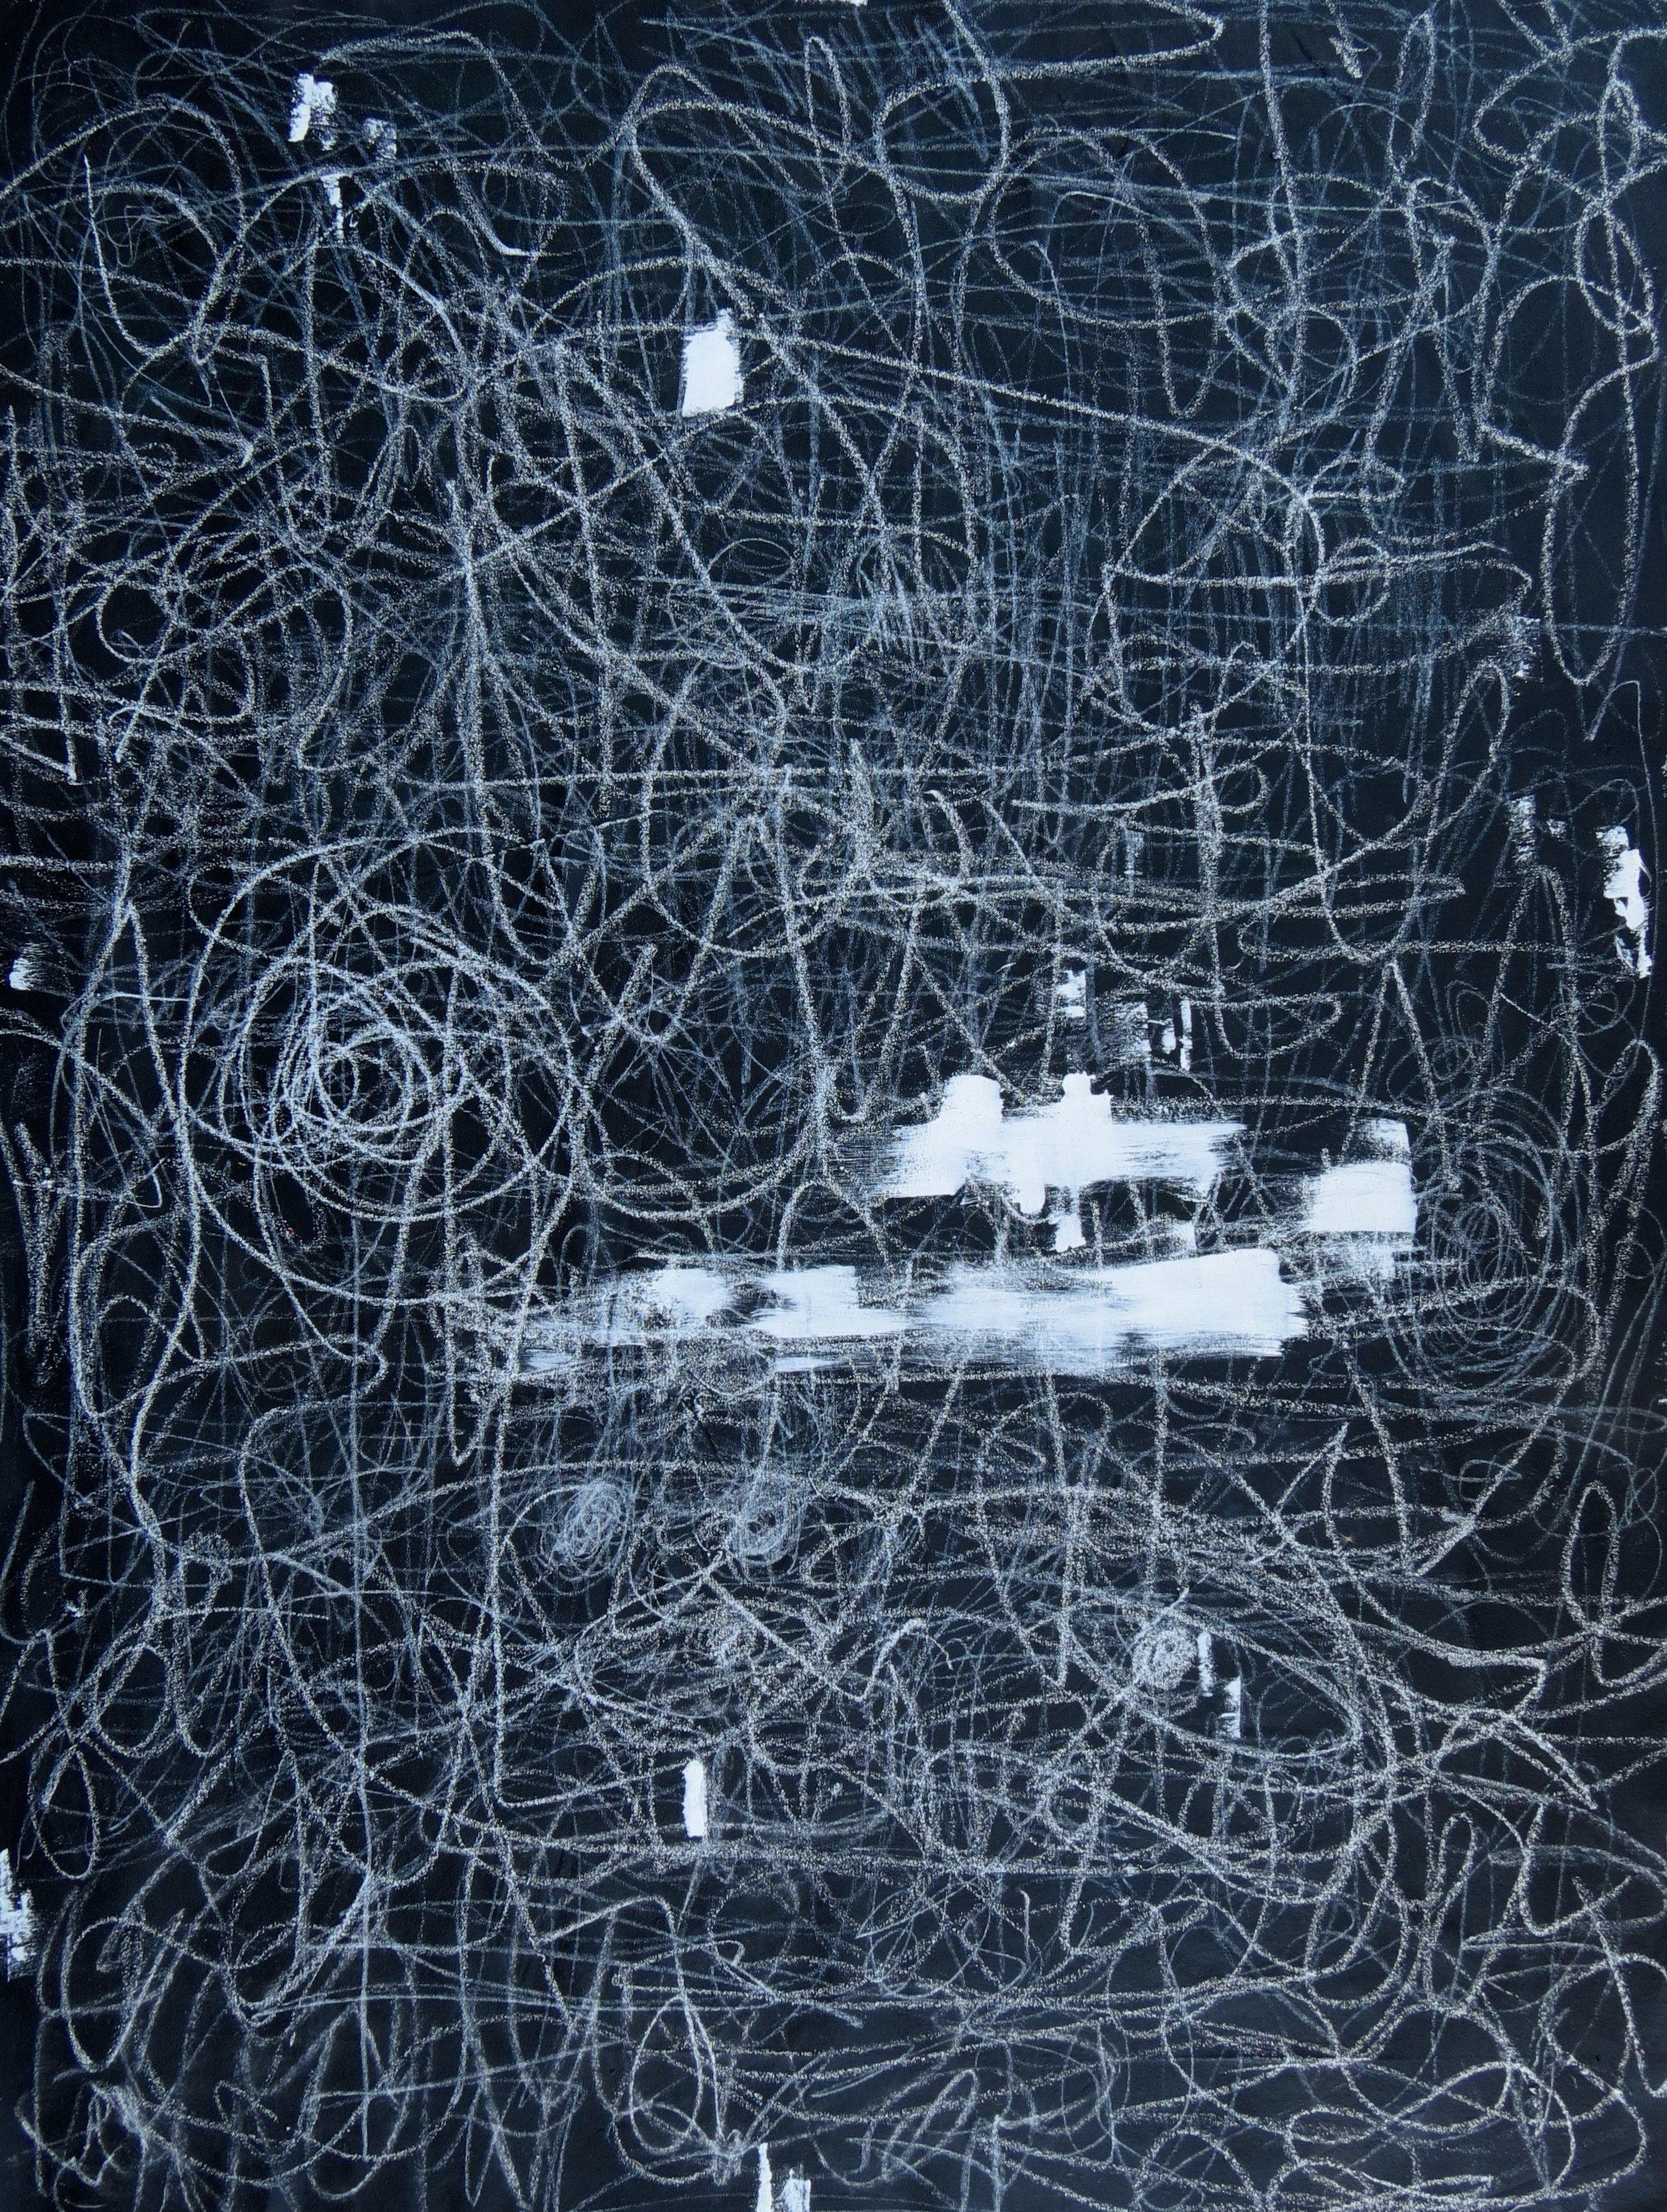 post-pivots , 2019, 6' x 4', chalk, oil paint stick, acrylic paint on canvas